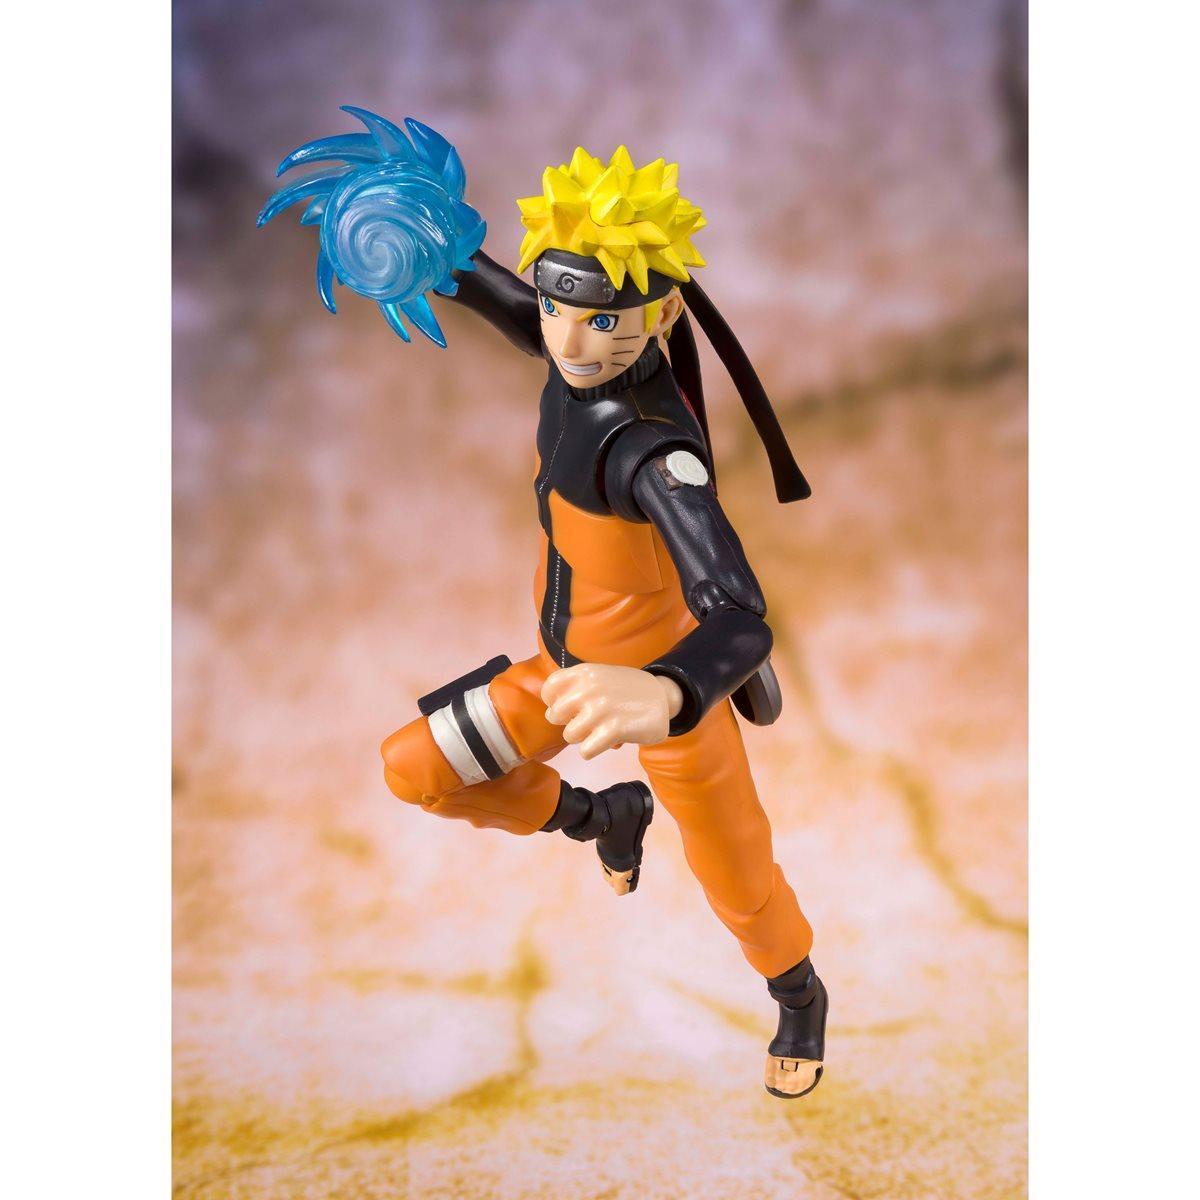 Оригинальная экшн-фигурка Bandai Figuarts Naruto - Наруто